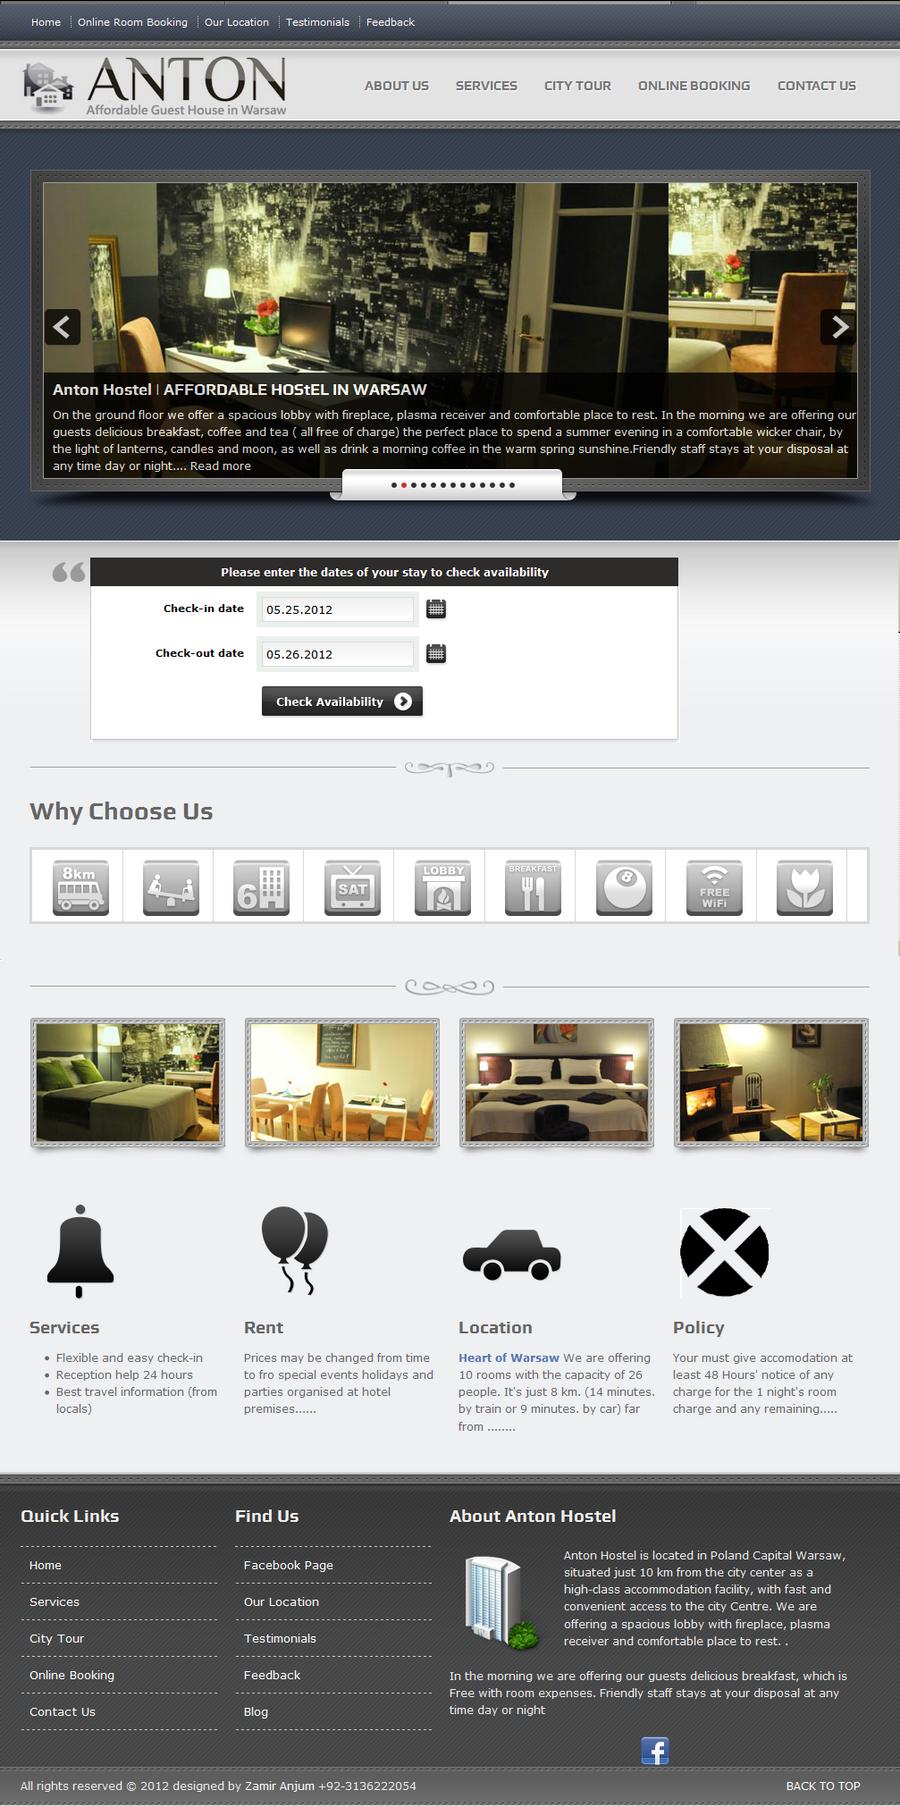 antonhostel.pl  II design work by zamir